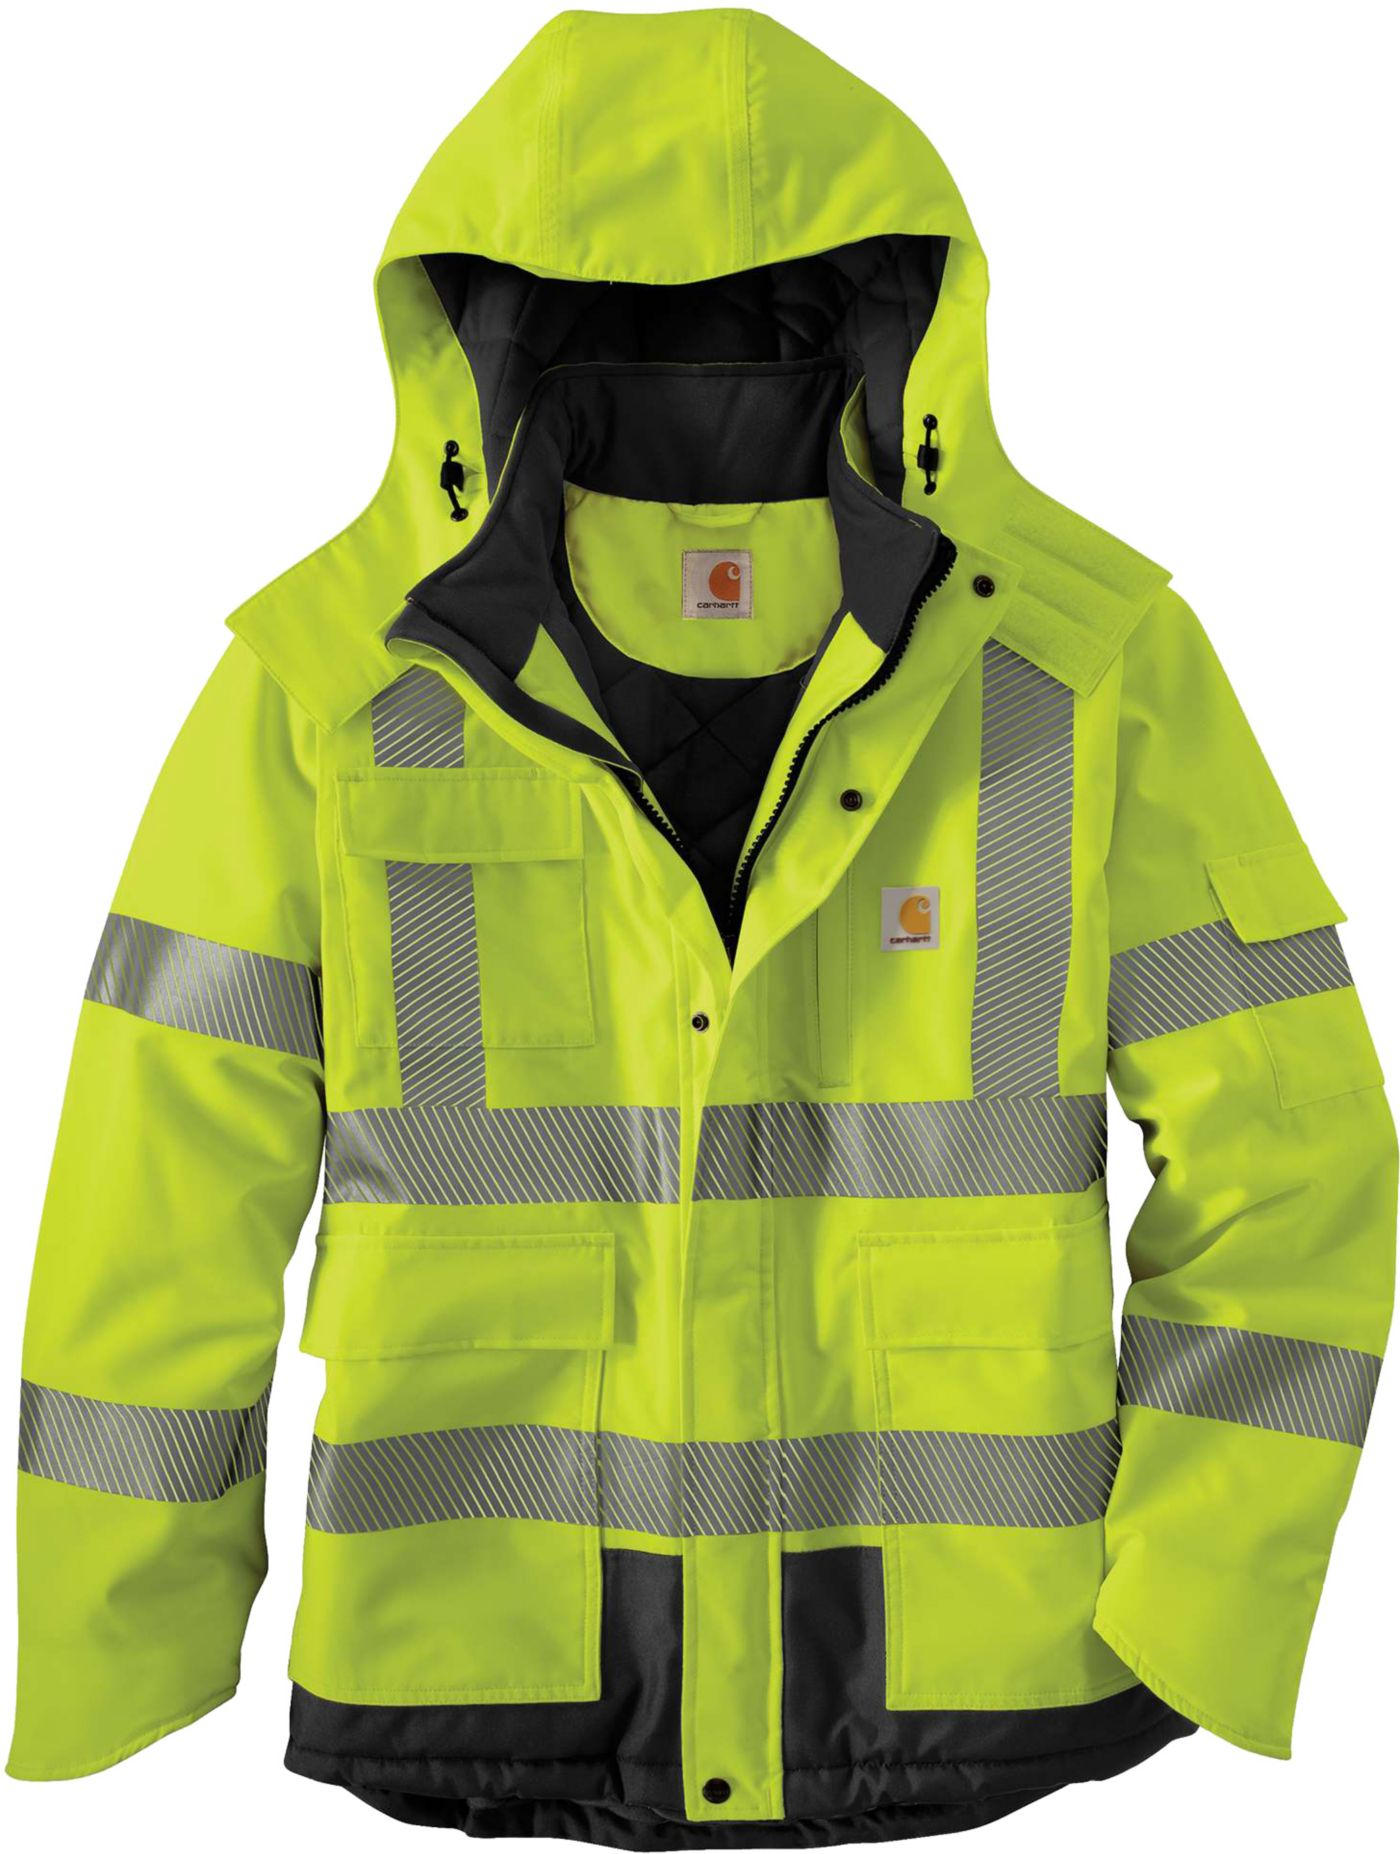 Carhartt Men's High Visibility Waterproof Class 3 Insulated Sherwood Jacket